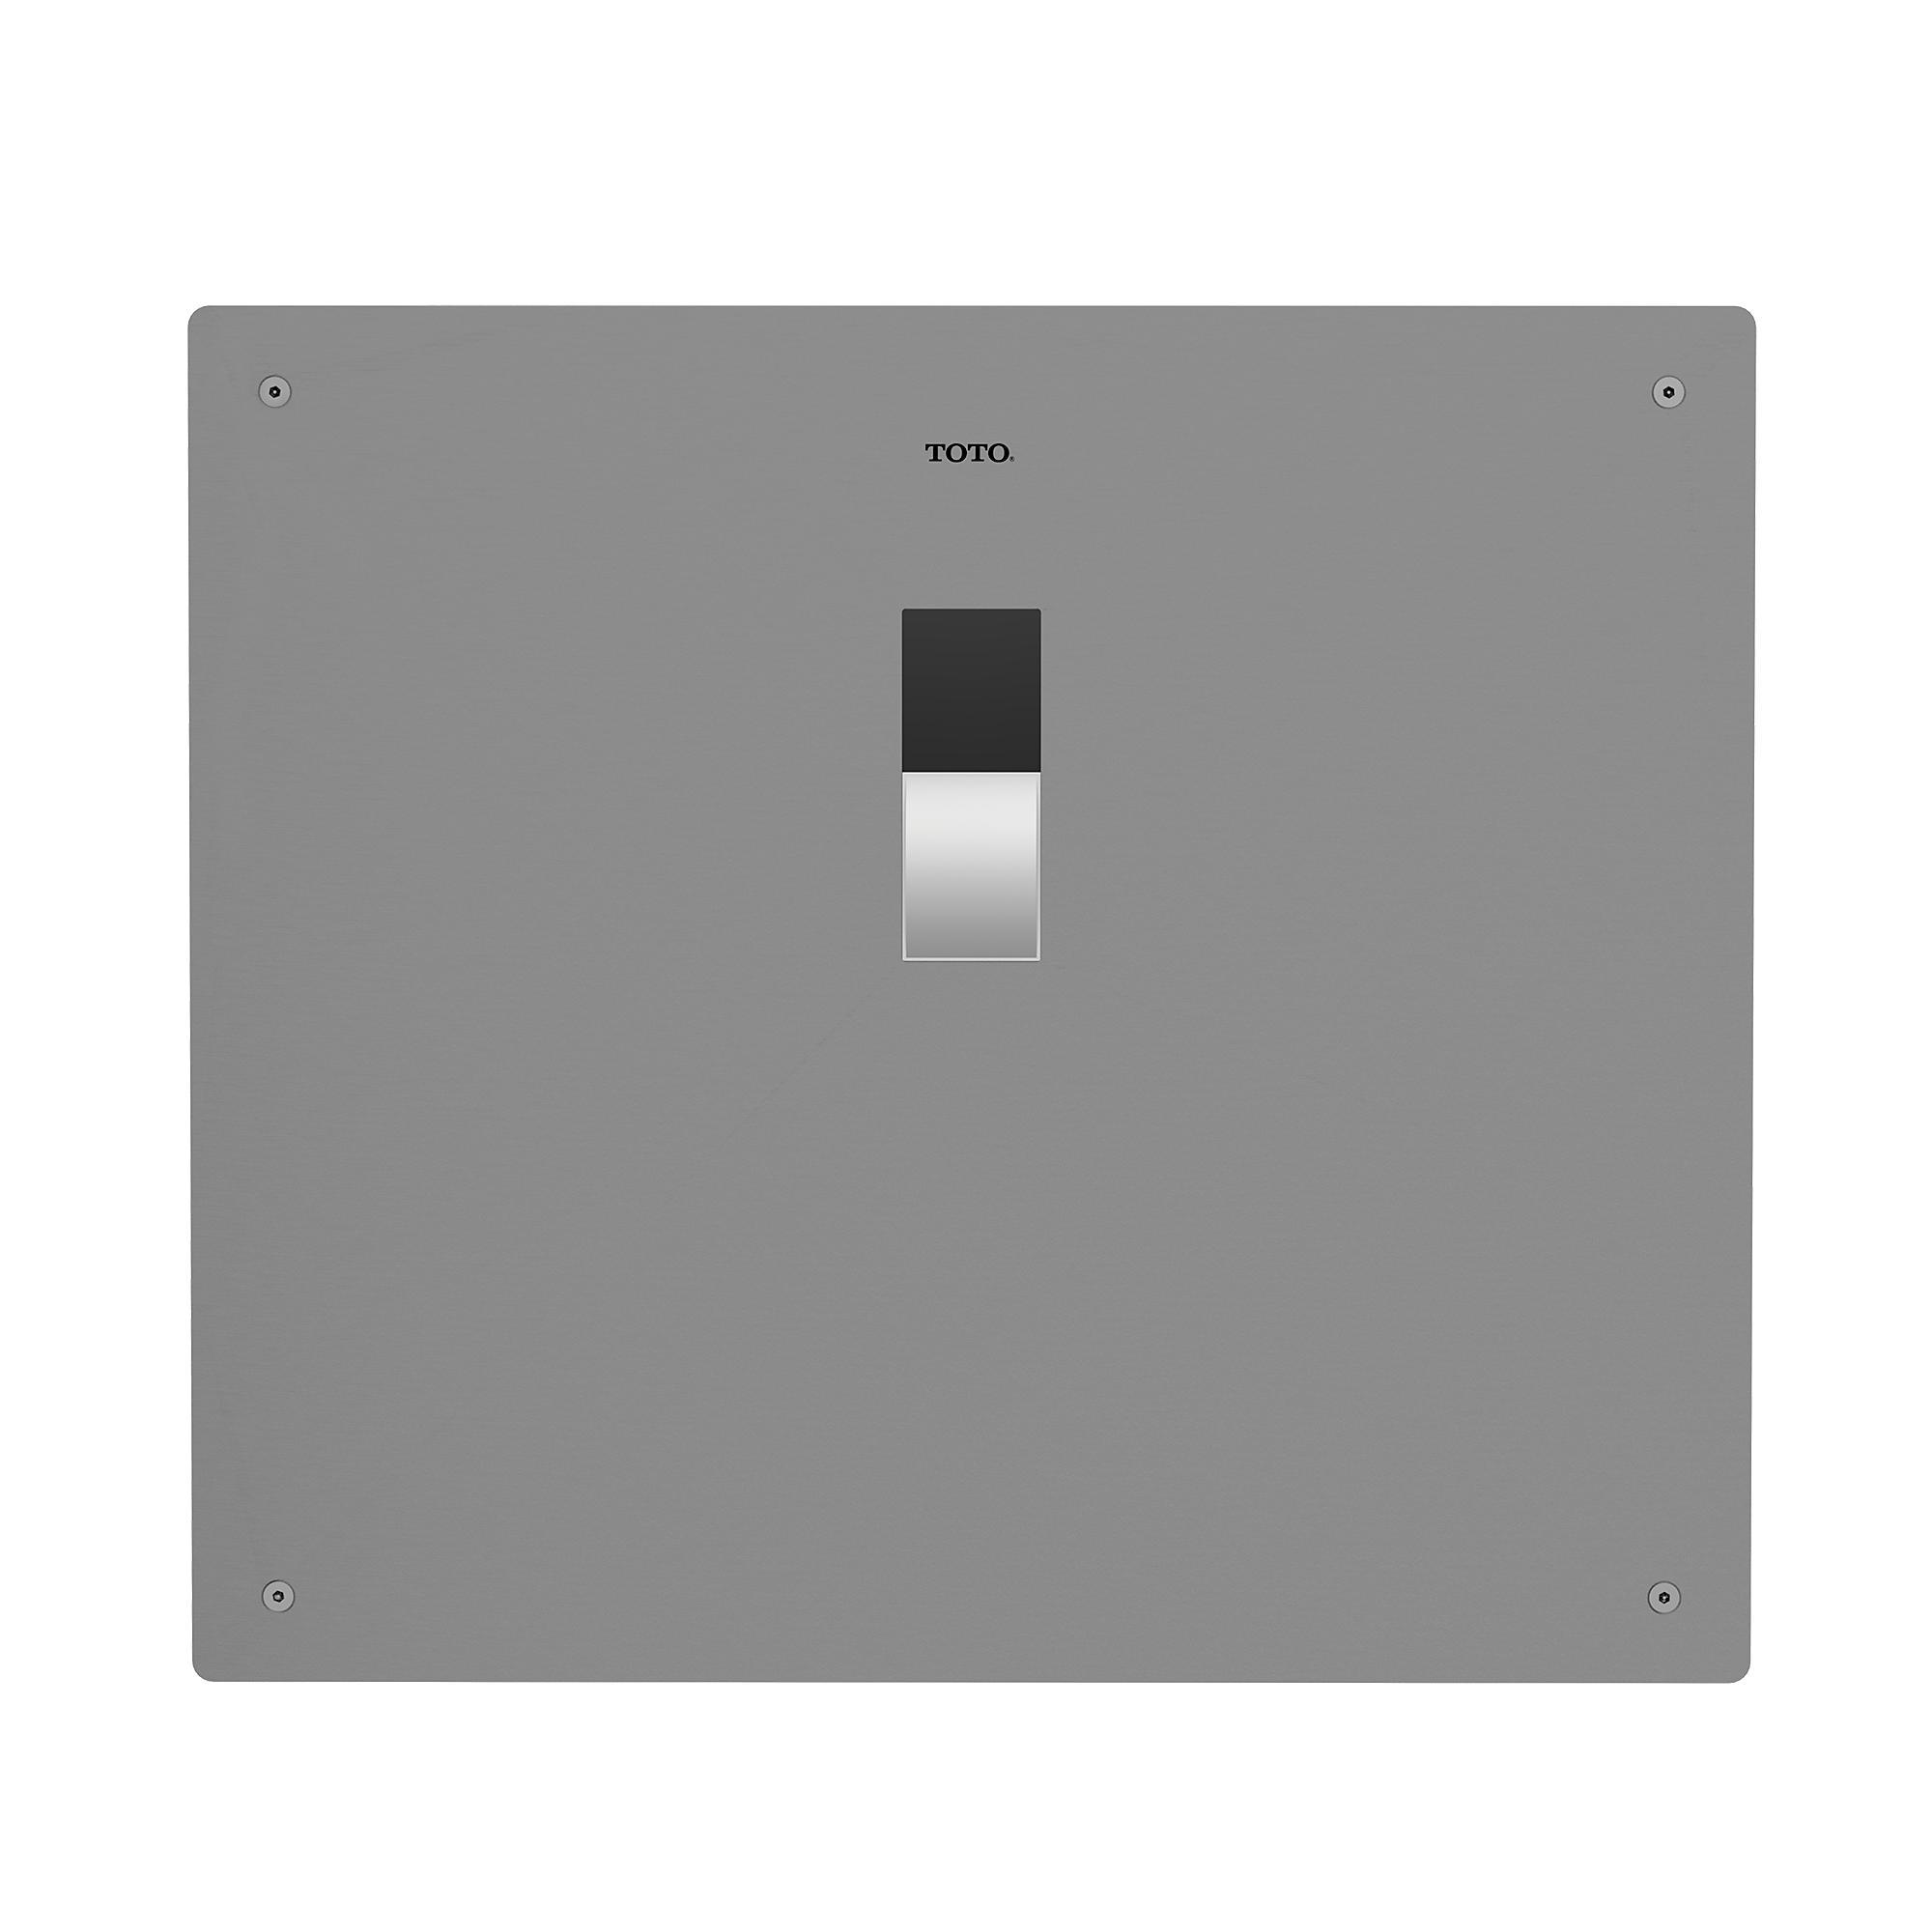 Teu2ua12 ss ecopower  ultra high efficiency concealed urinal flush valve   0 125 gpf  v b  set   top spud  0